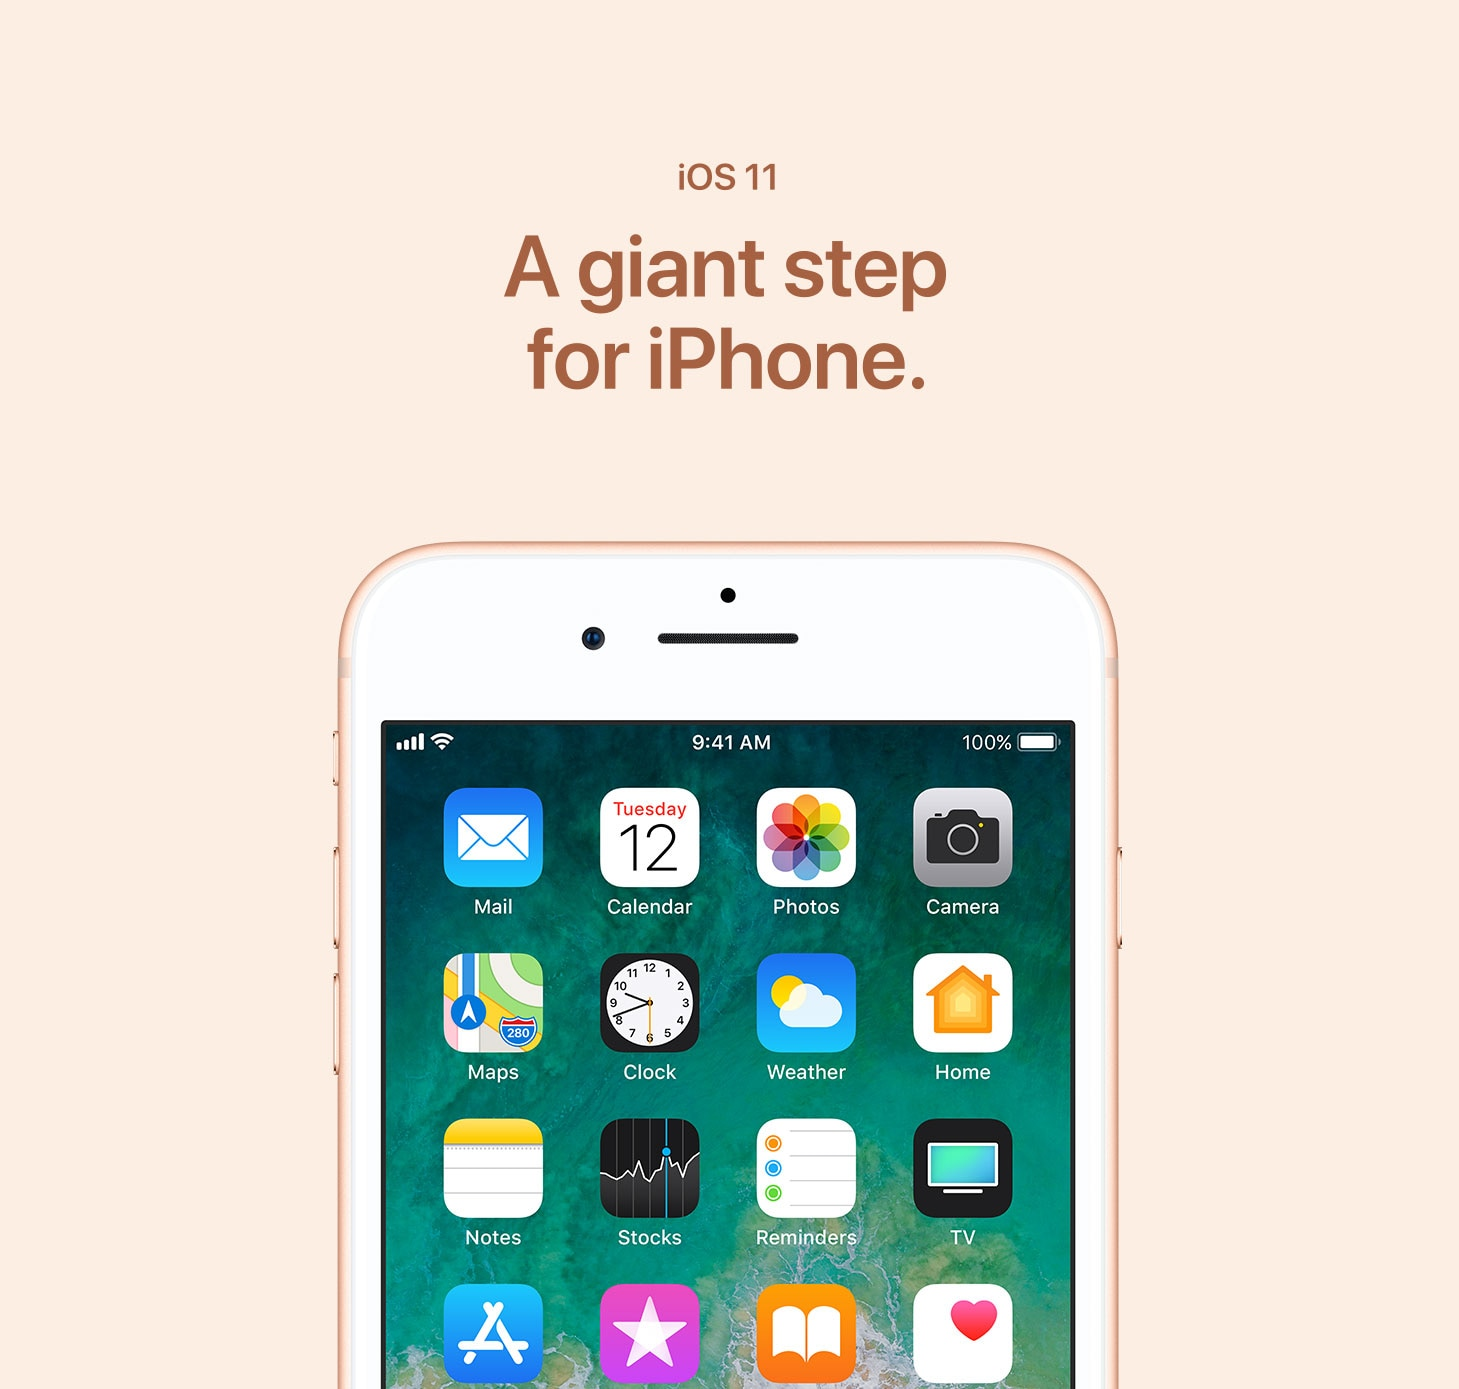 Can I Make An Iphone Prepaid